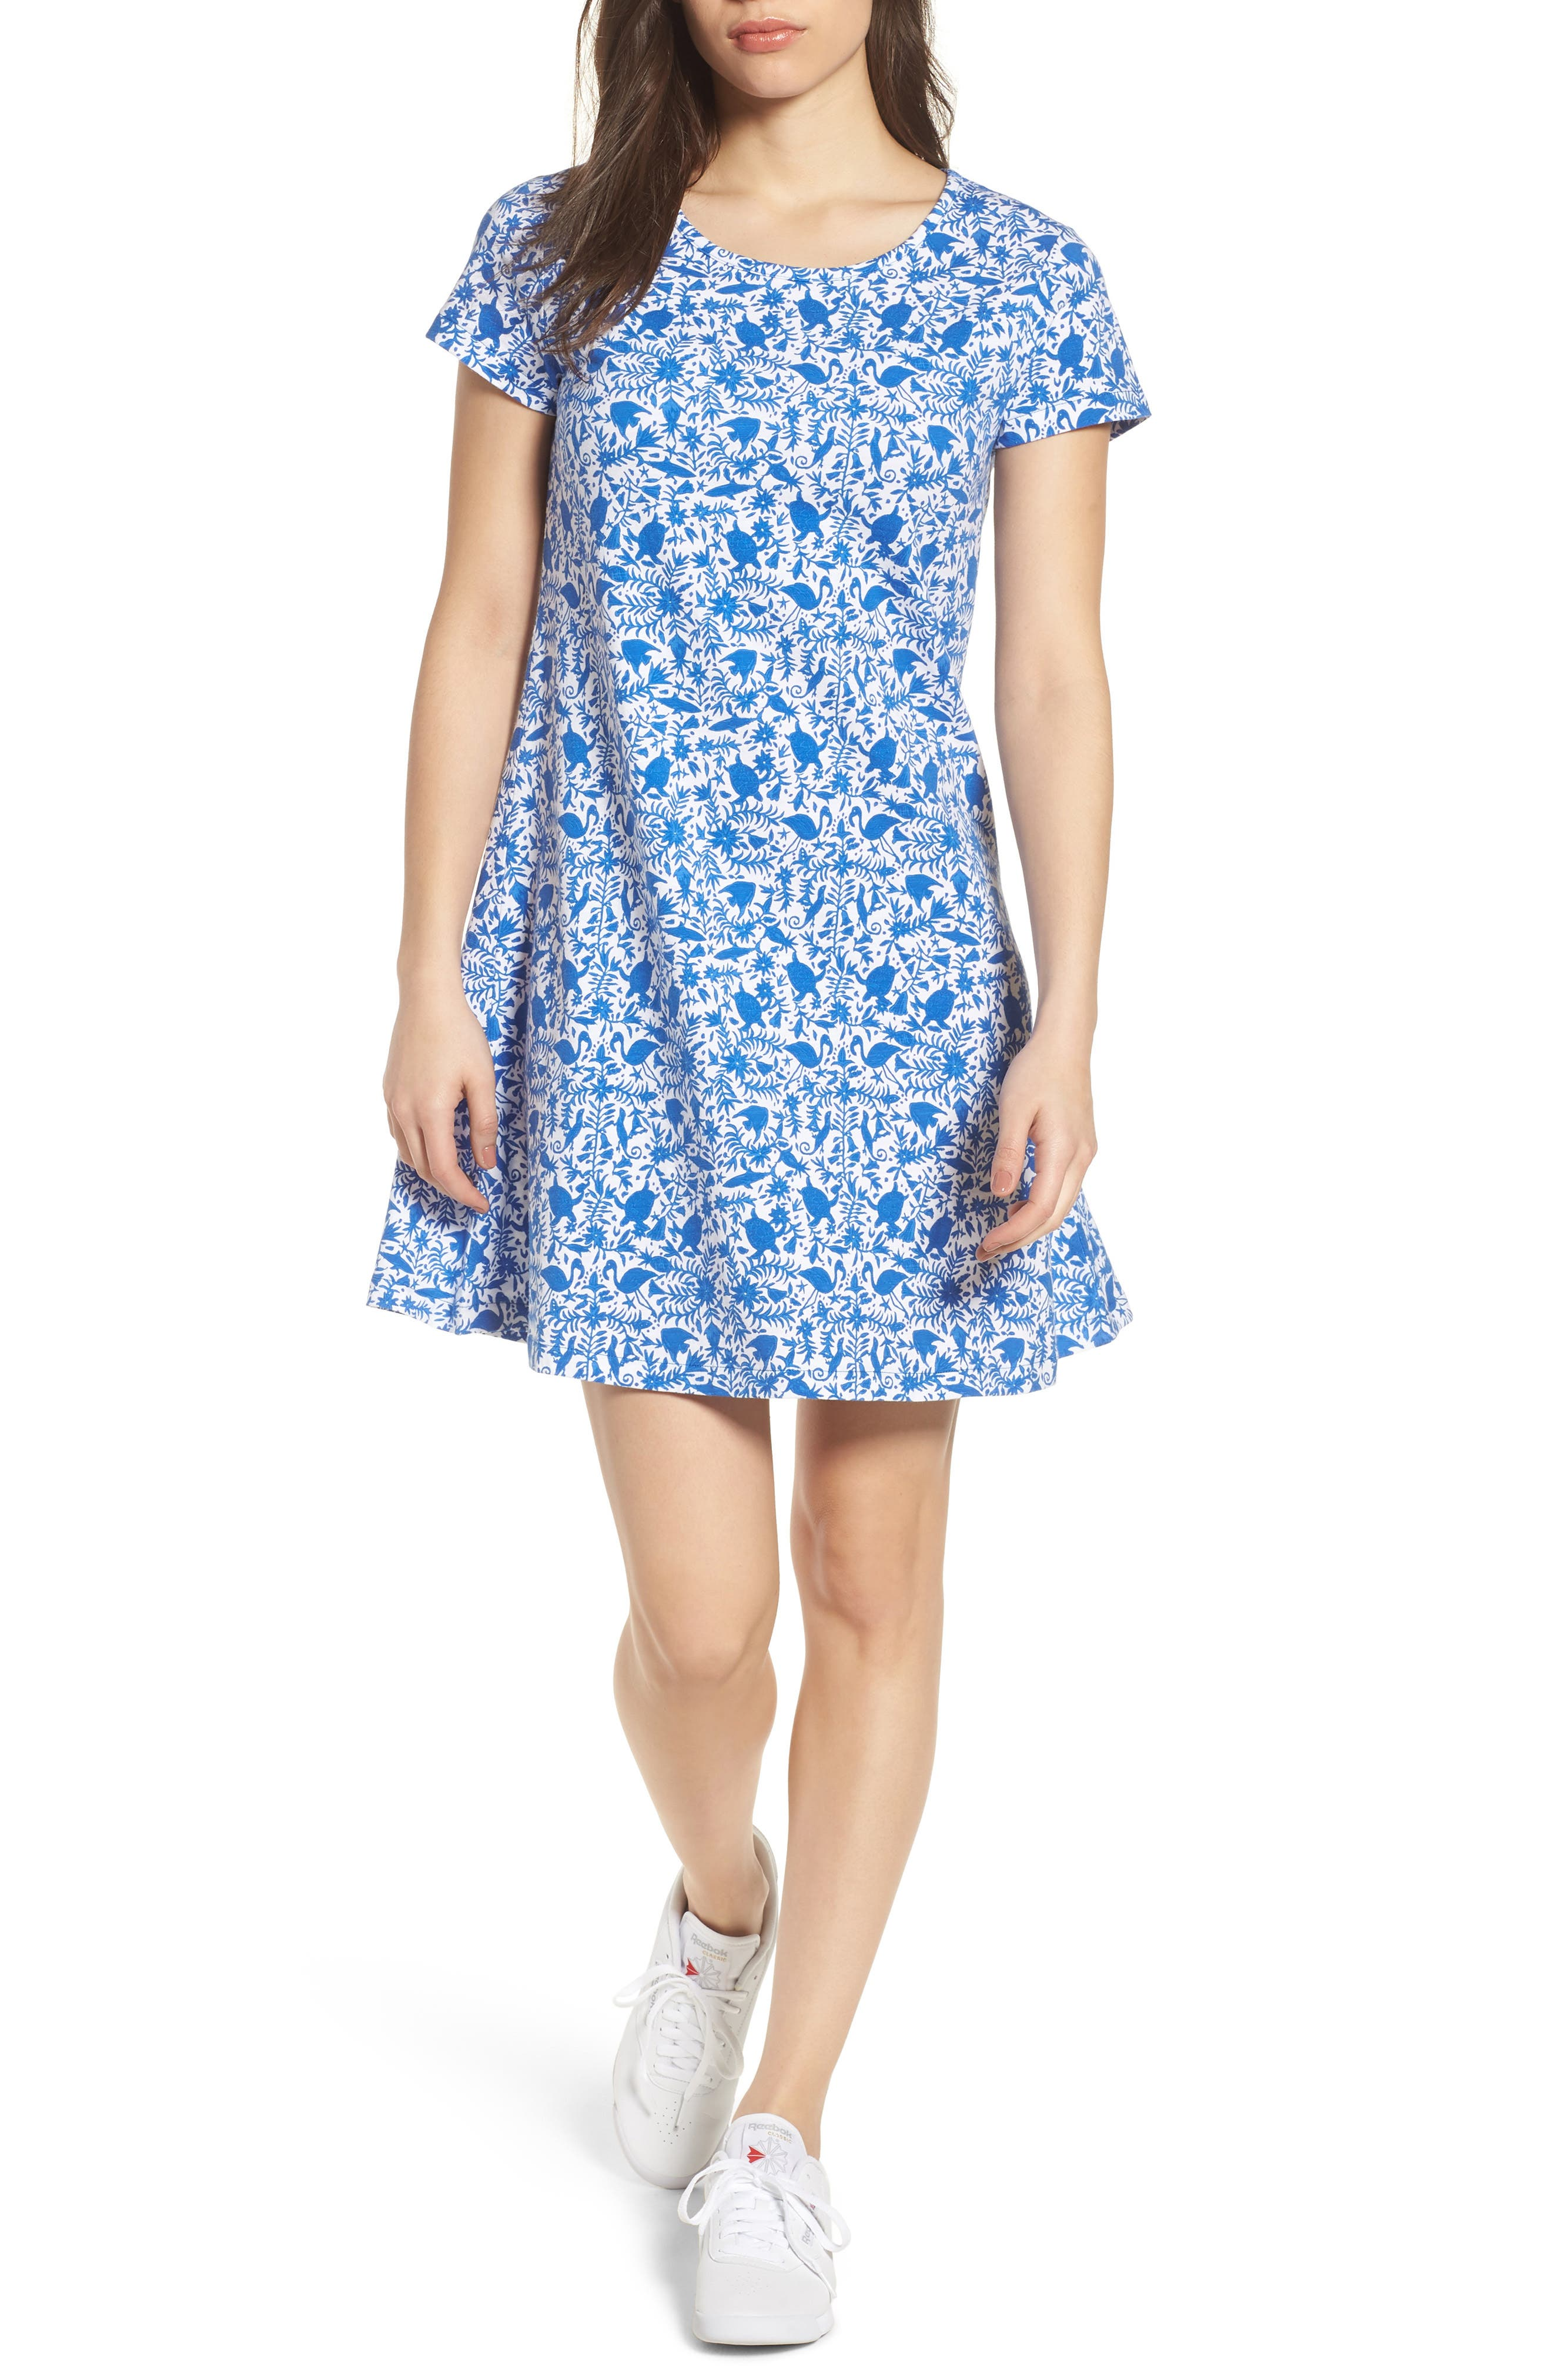 Bahamas Otomi Print Stretch Cotton Dress,                             Main thumbnail 1, color,                             Yacht Blue